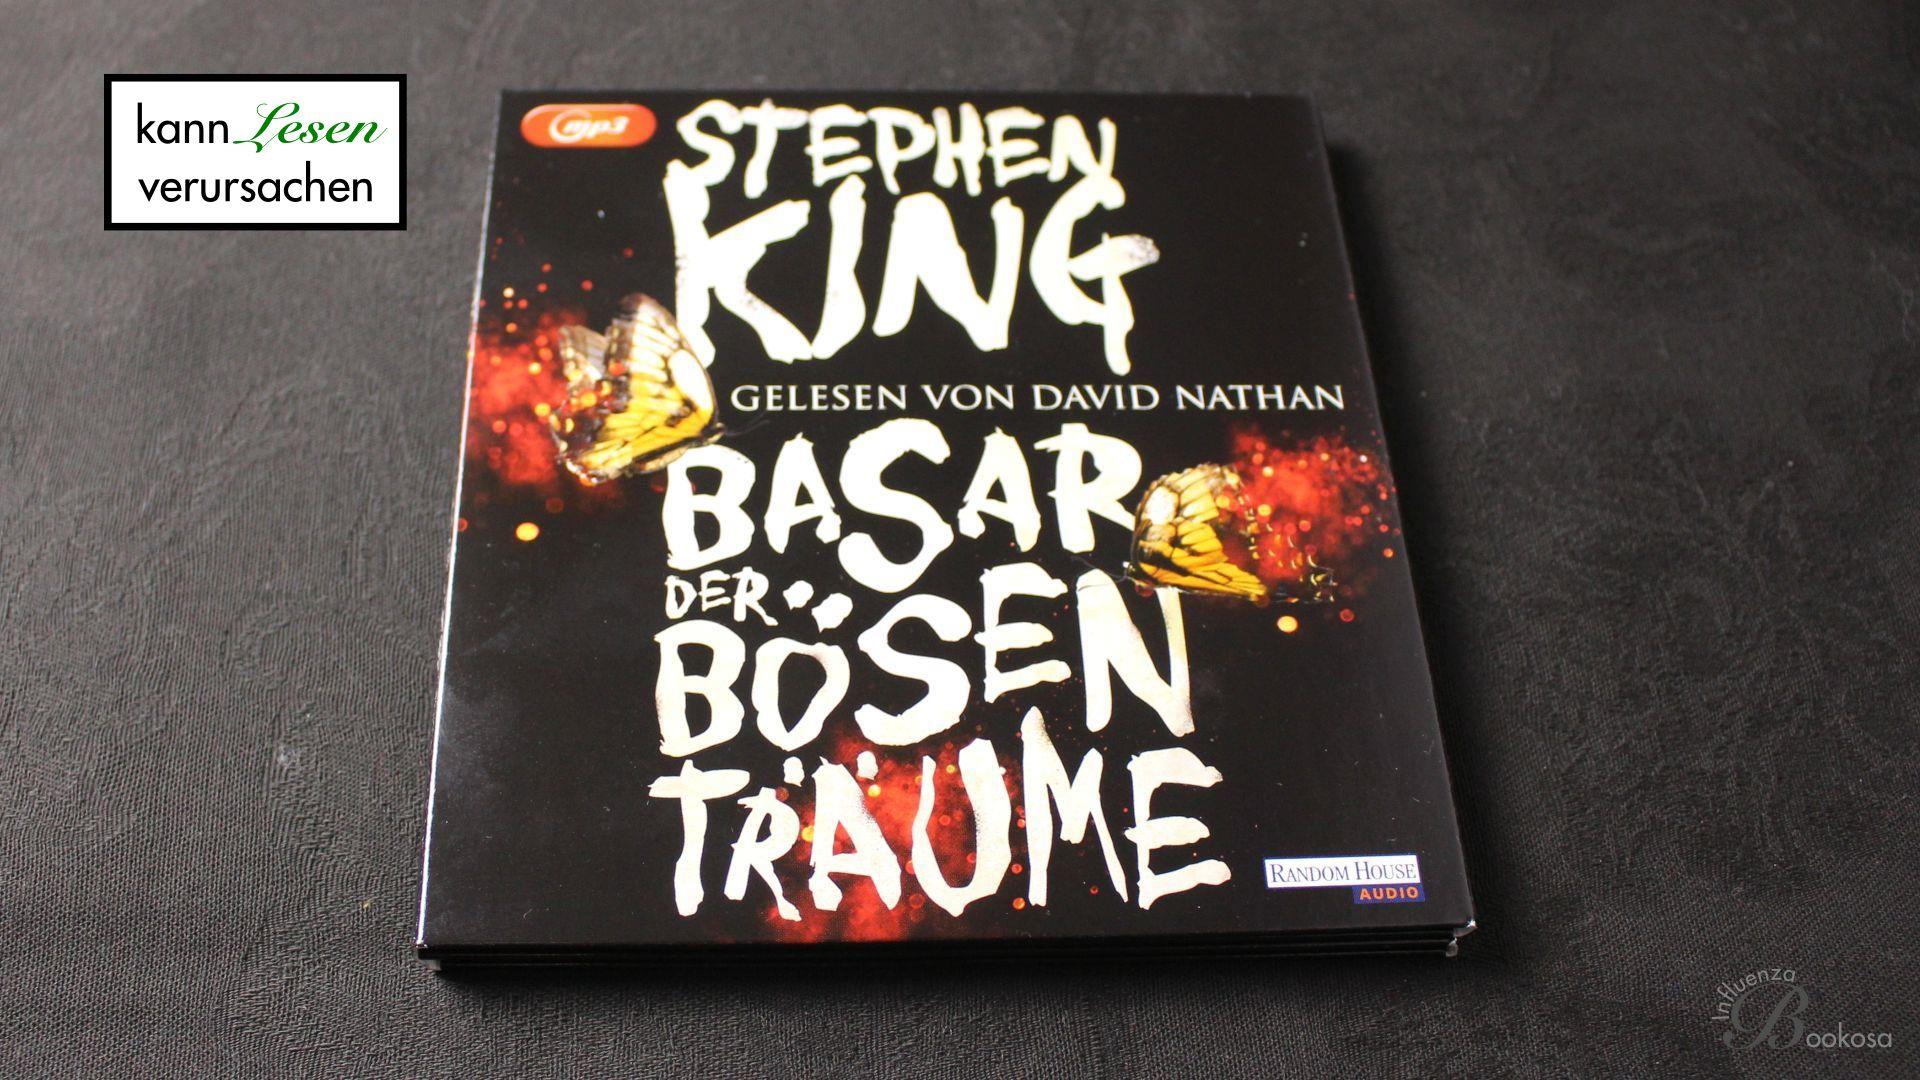 Stephen King - Basar der bösen Träume - Hörbuch